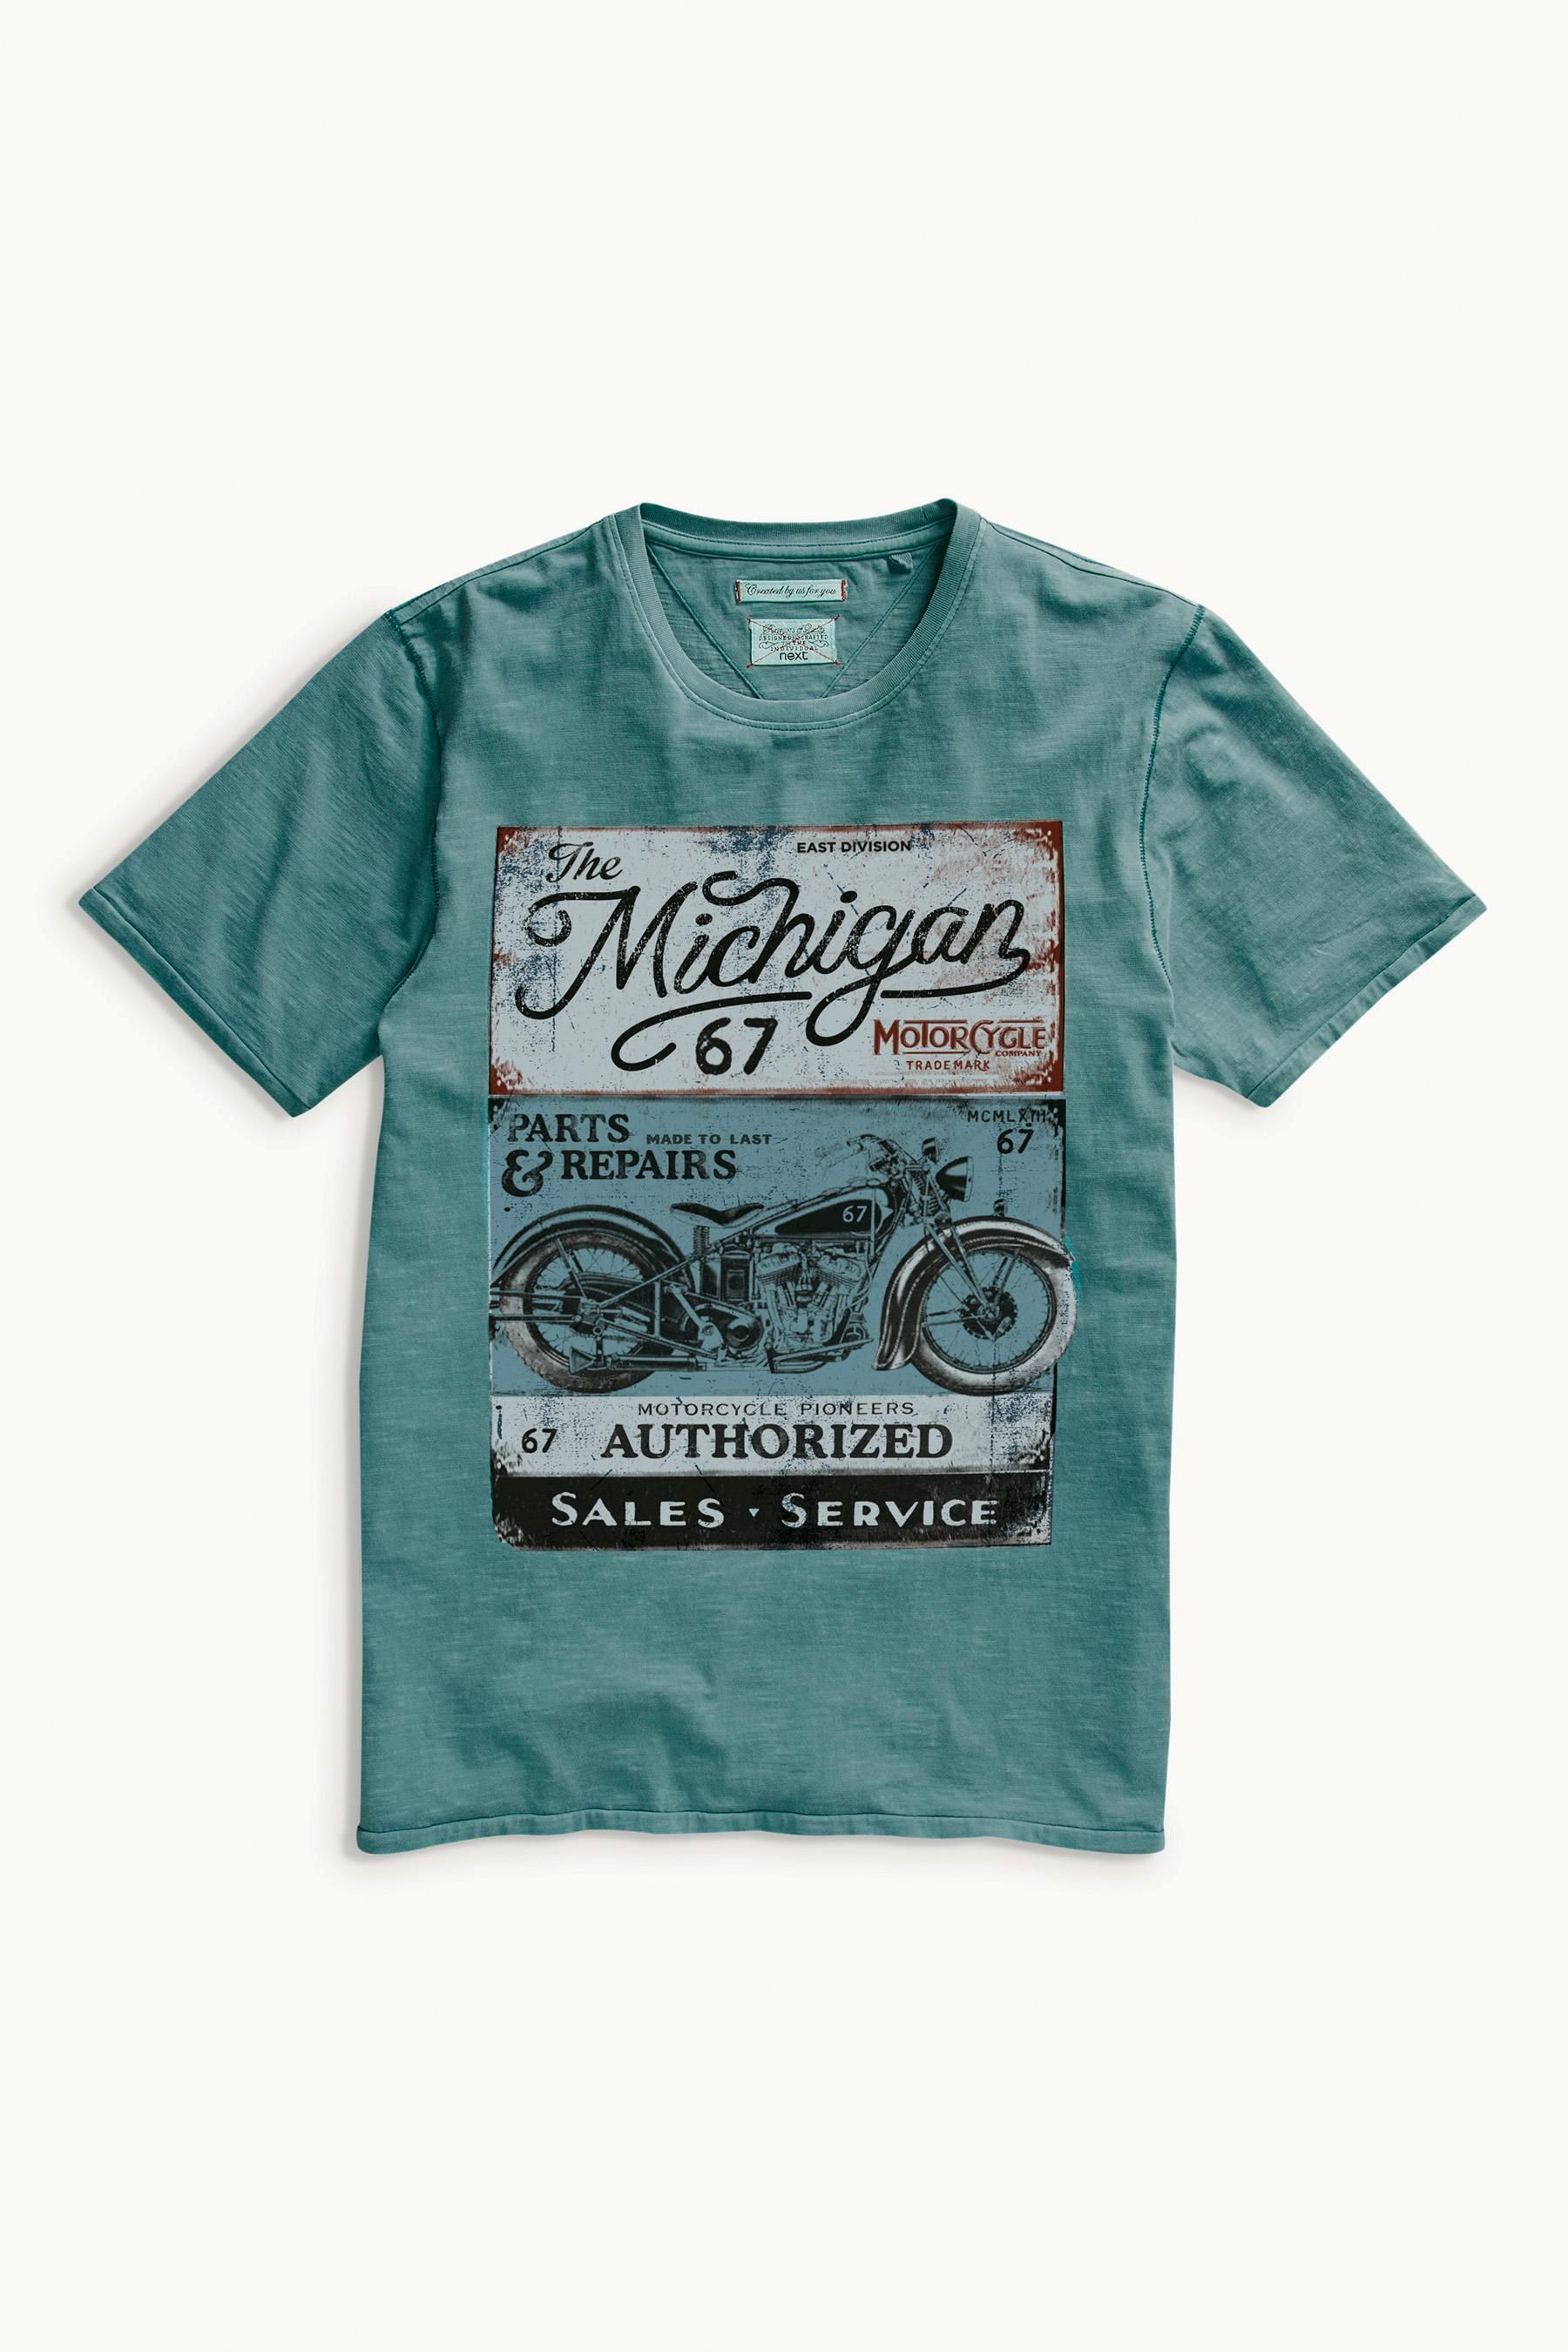 835aab8163 Acheter T-shirt Michigan Motor bleu sarcelle en ligne sur Next   France  Camisetas Estampadas